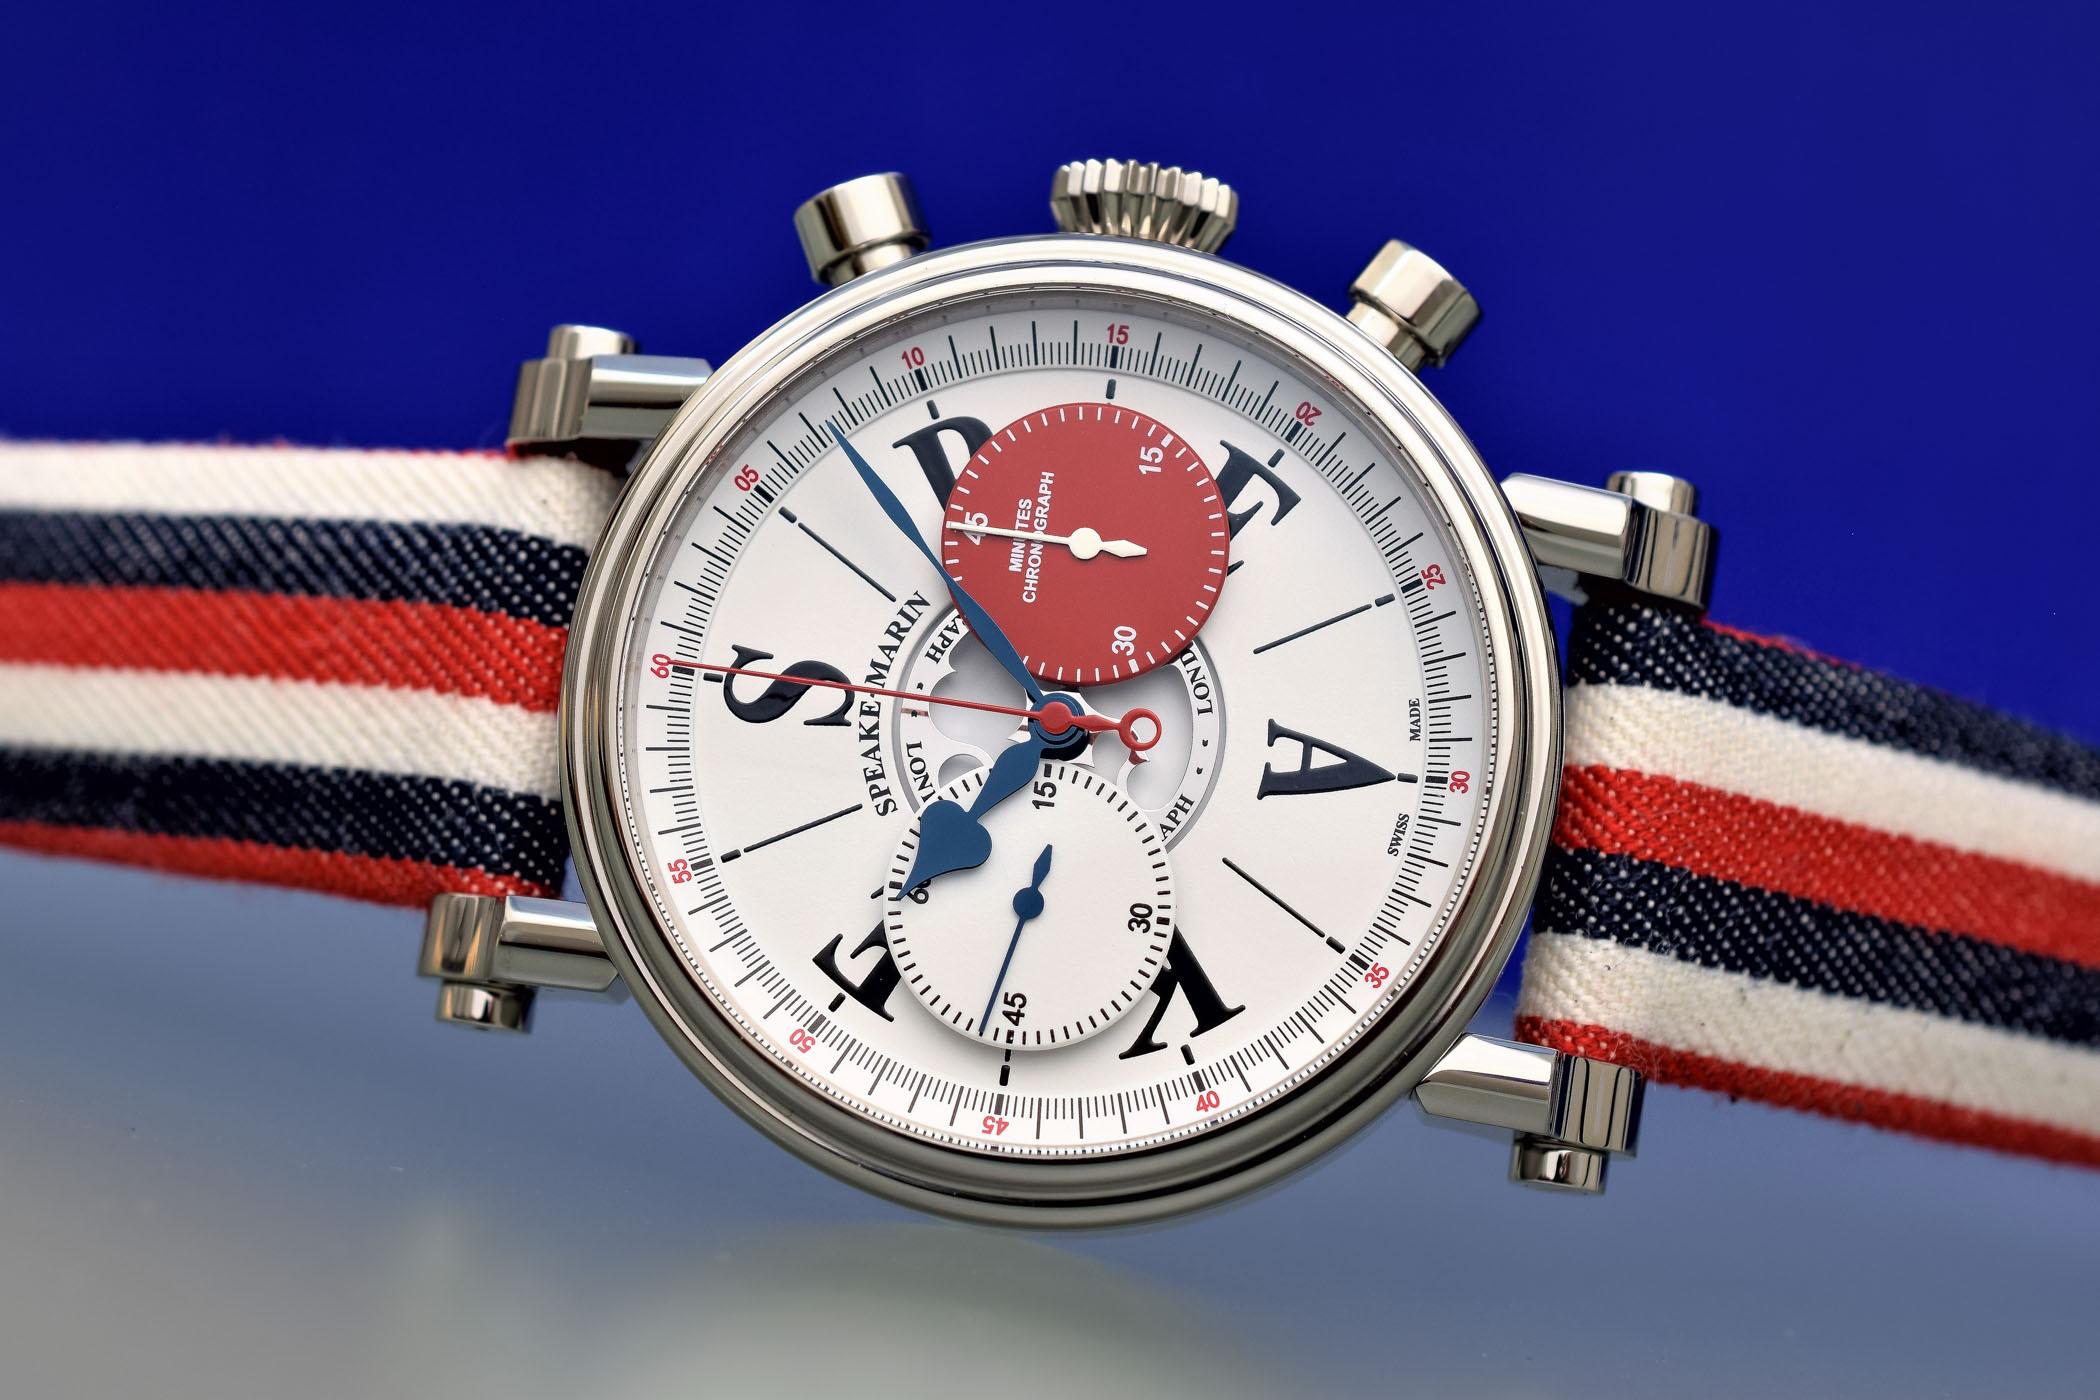 Speake-Marin London Chronograph valjoux 92